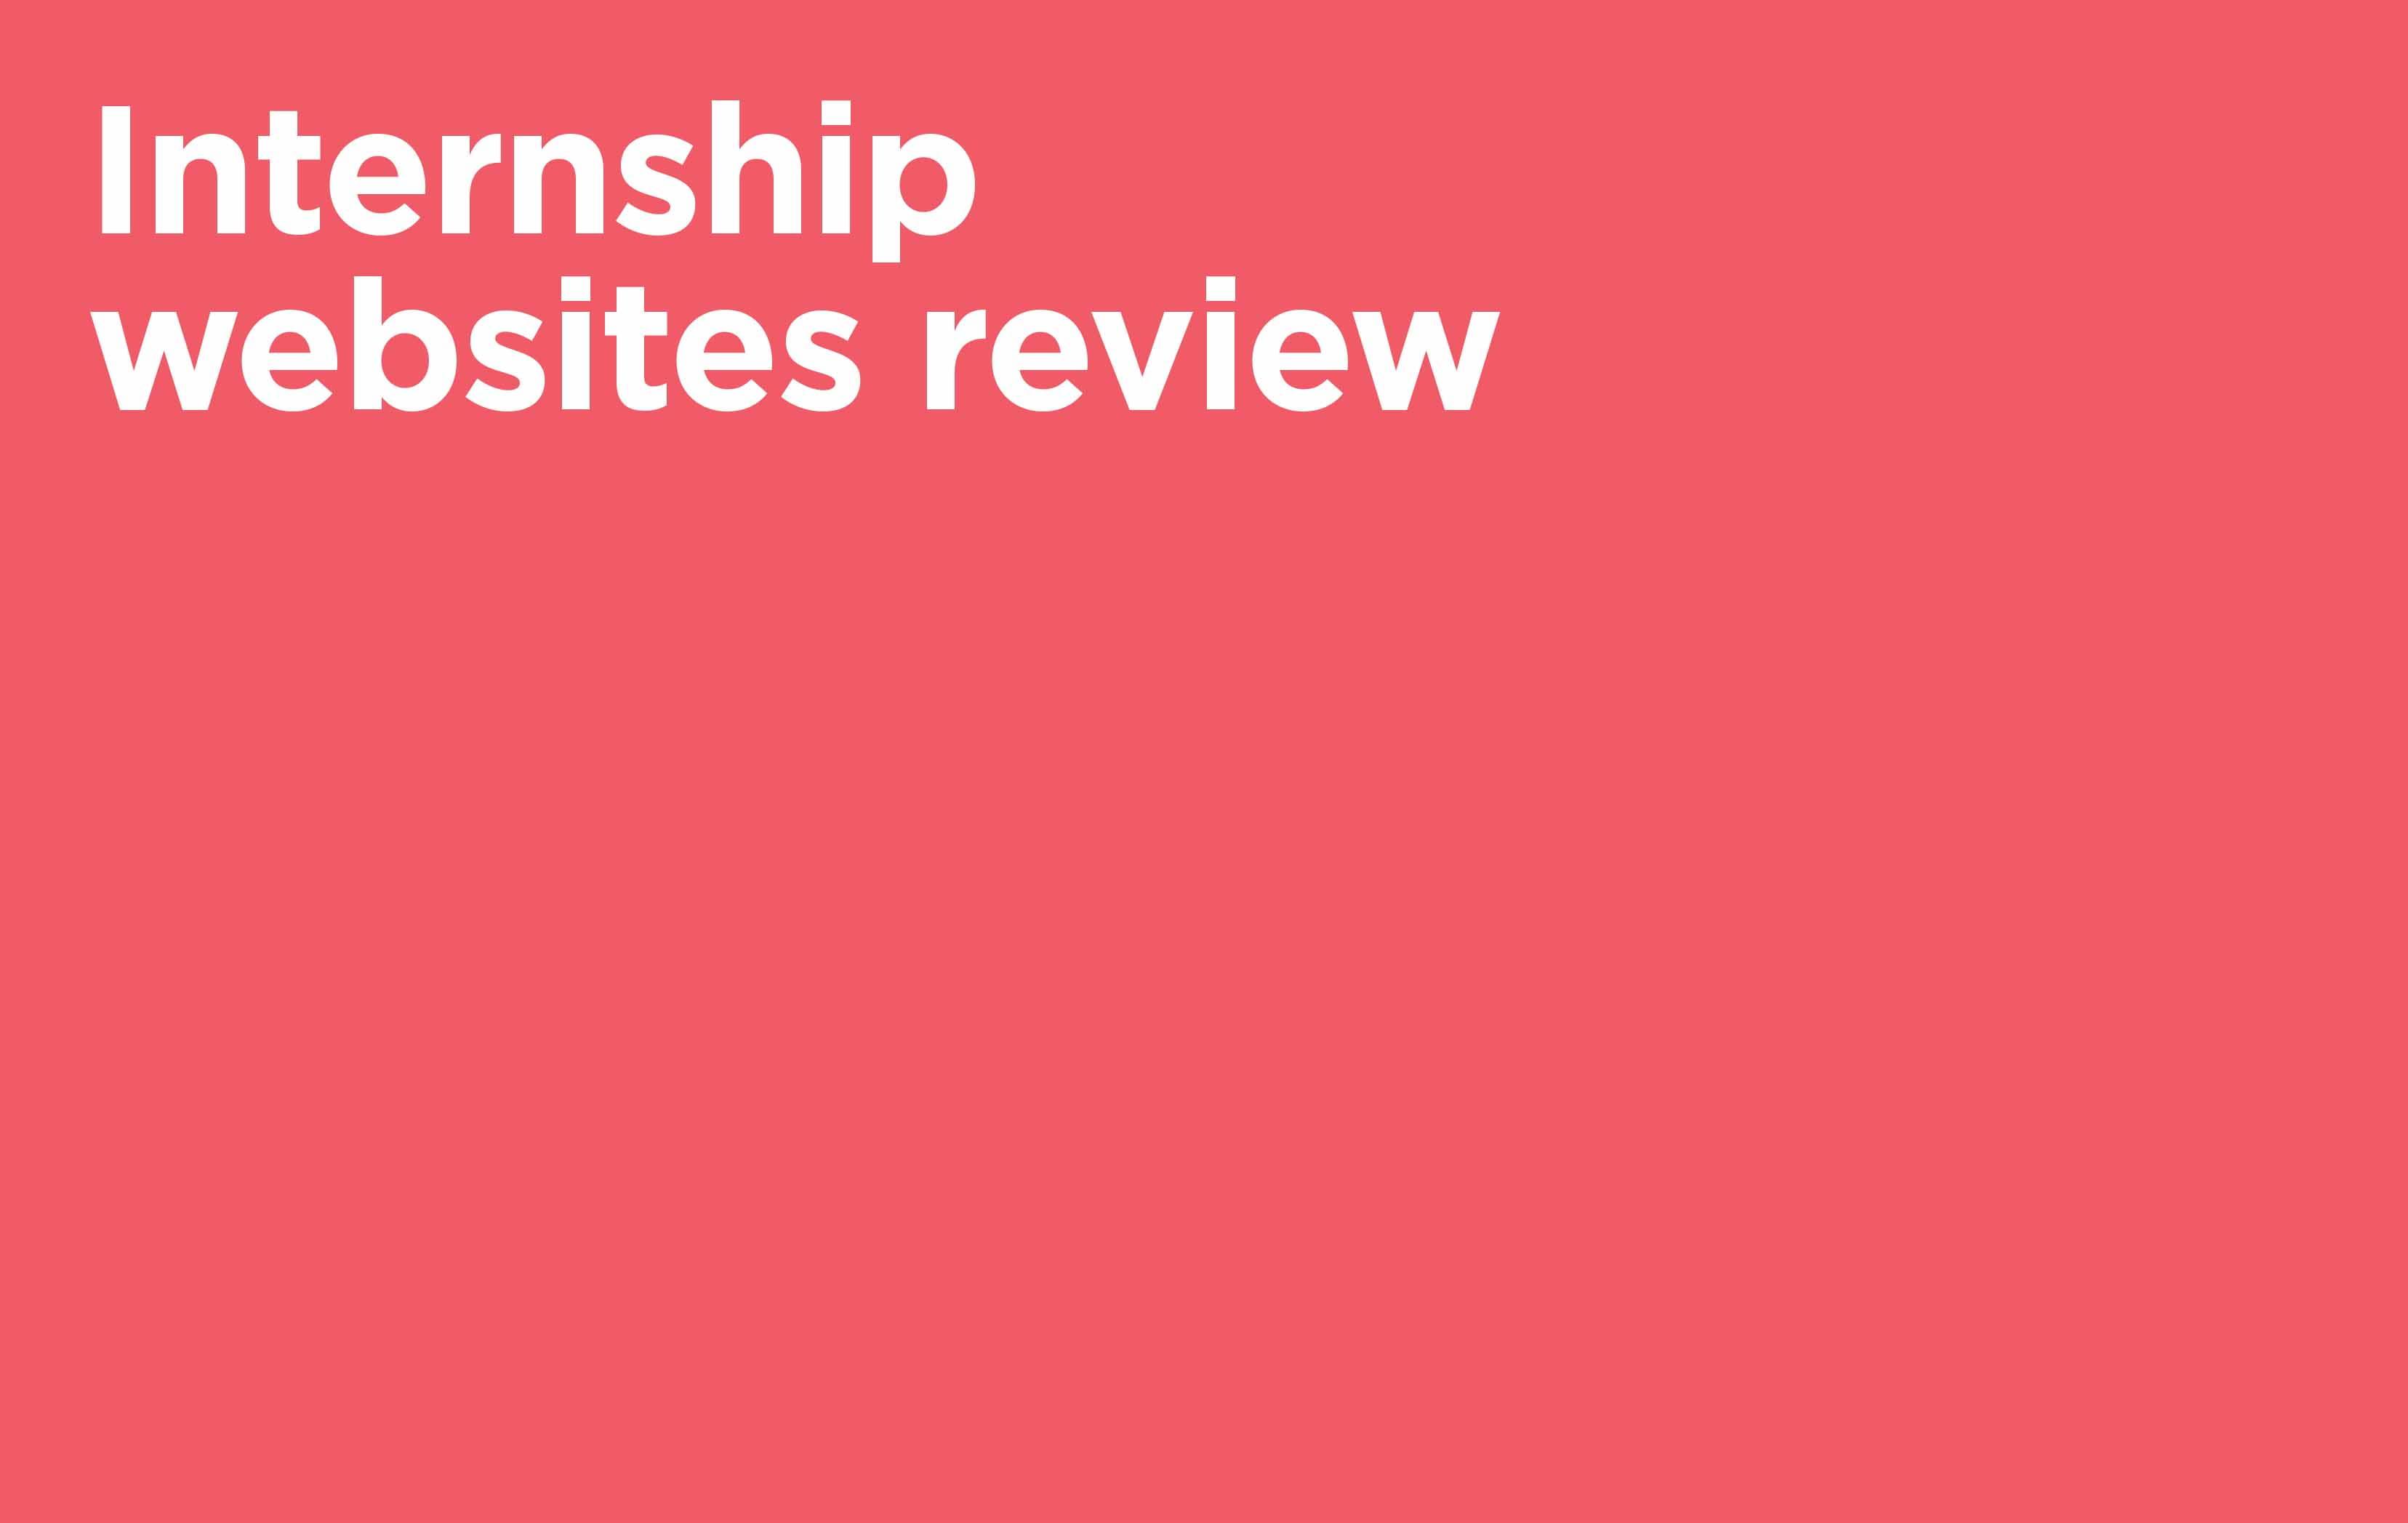 Internship Websites Review